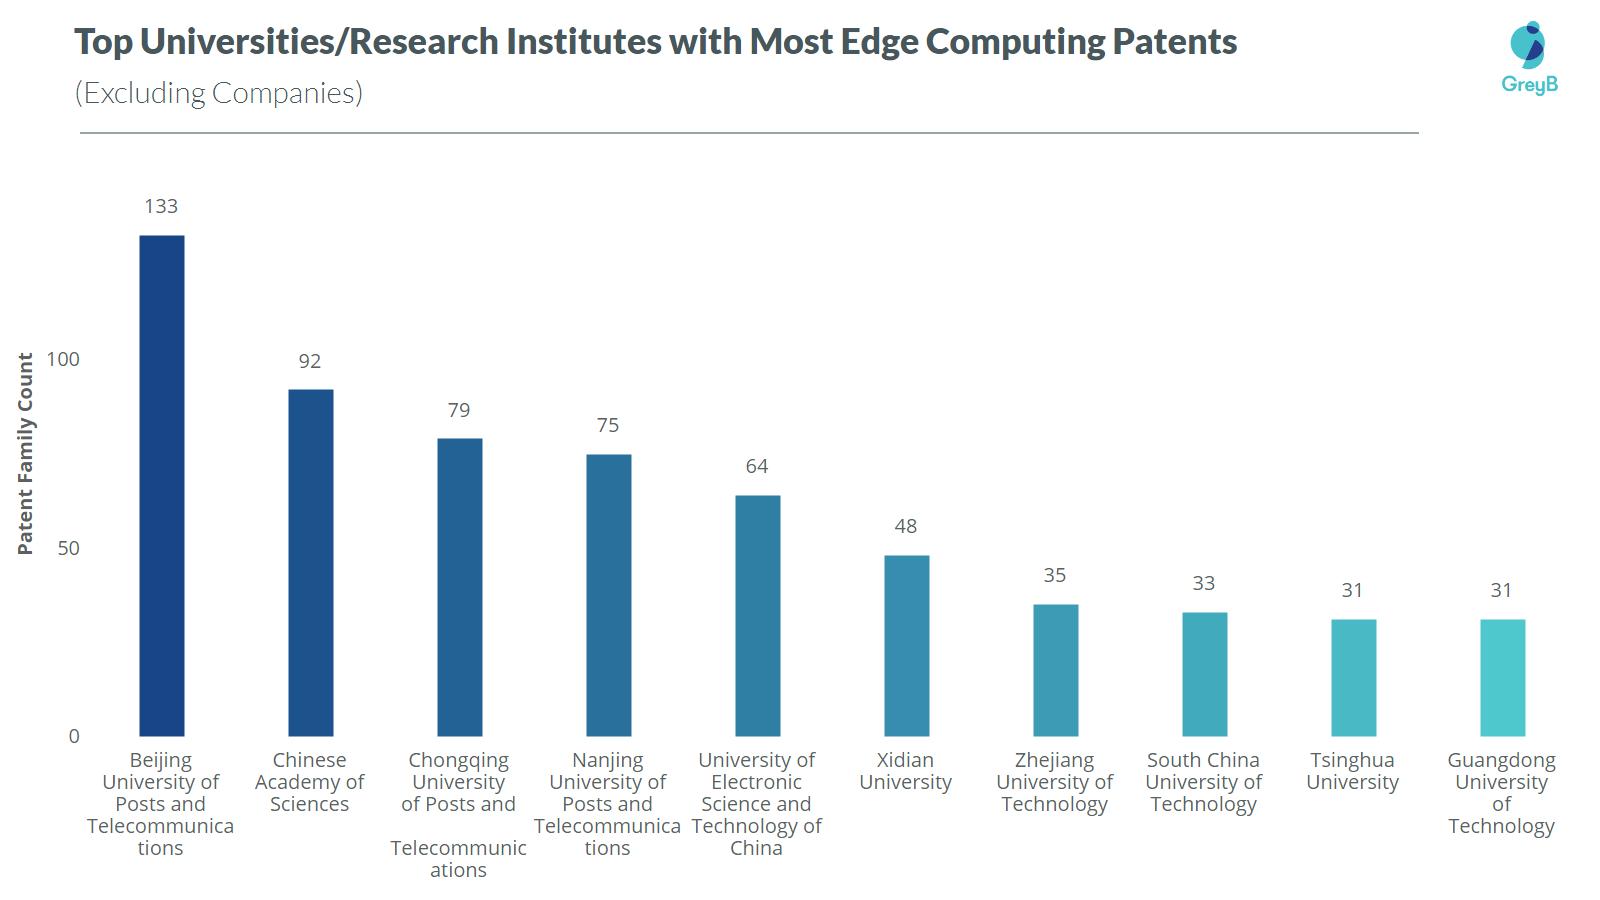 Top universities in edge computing patents